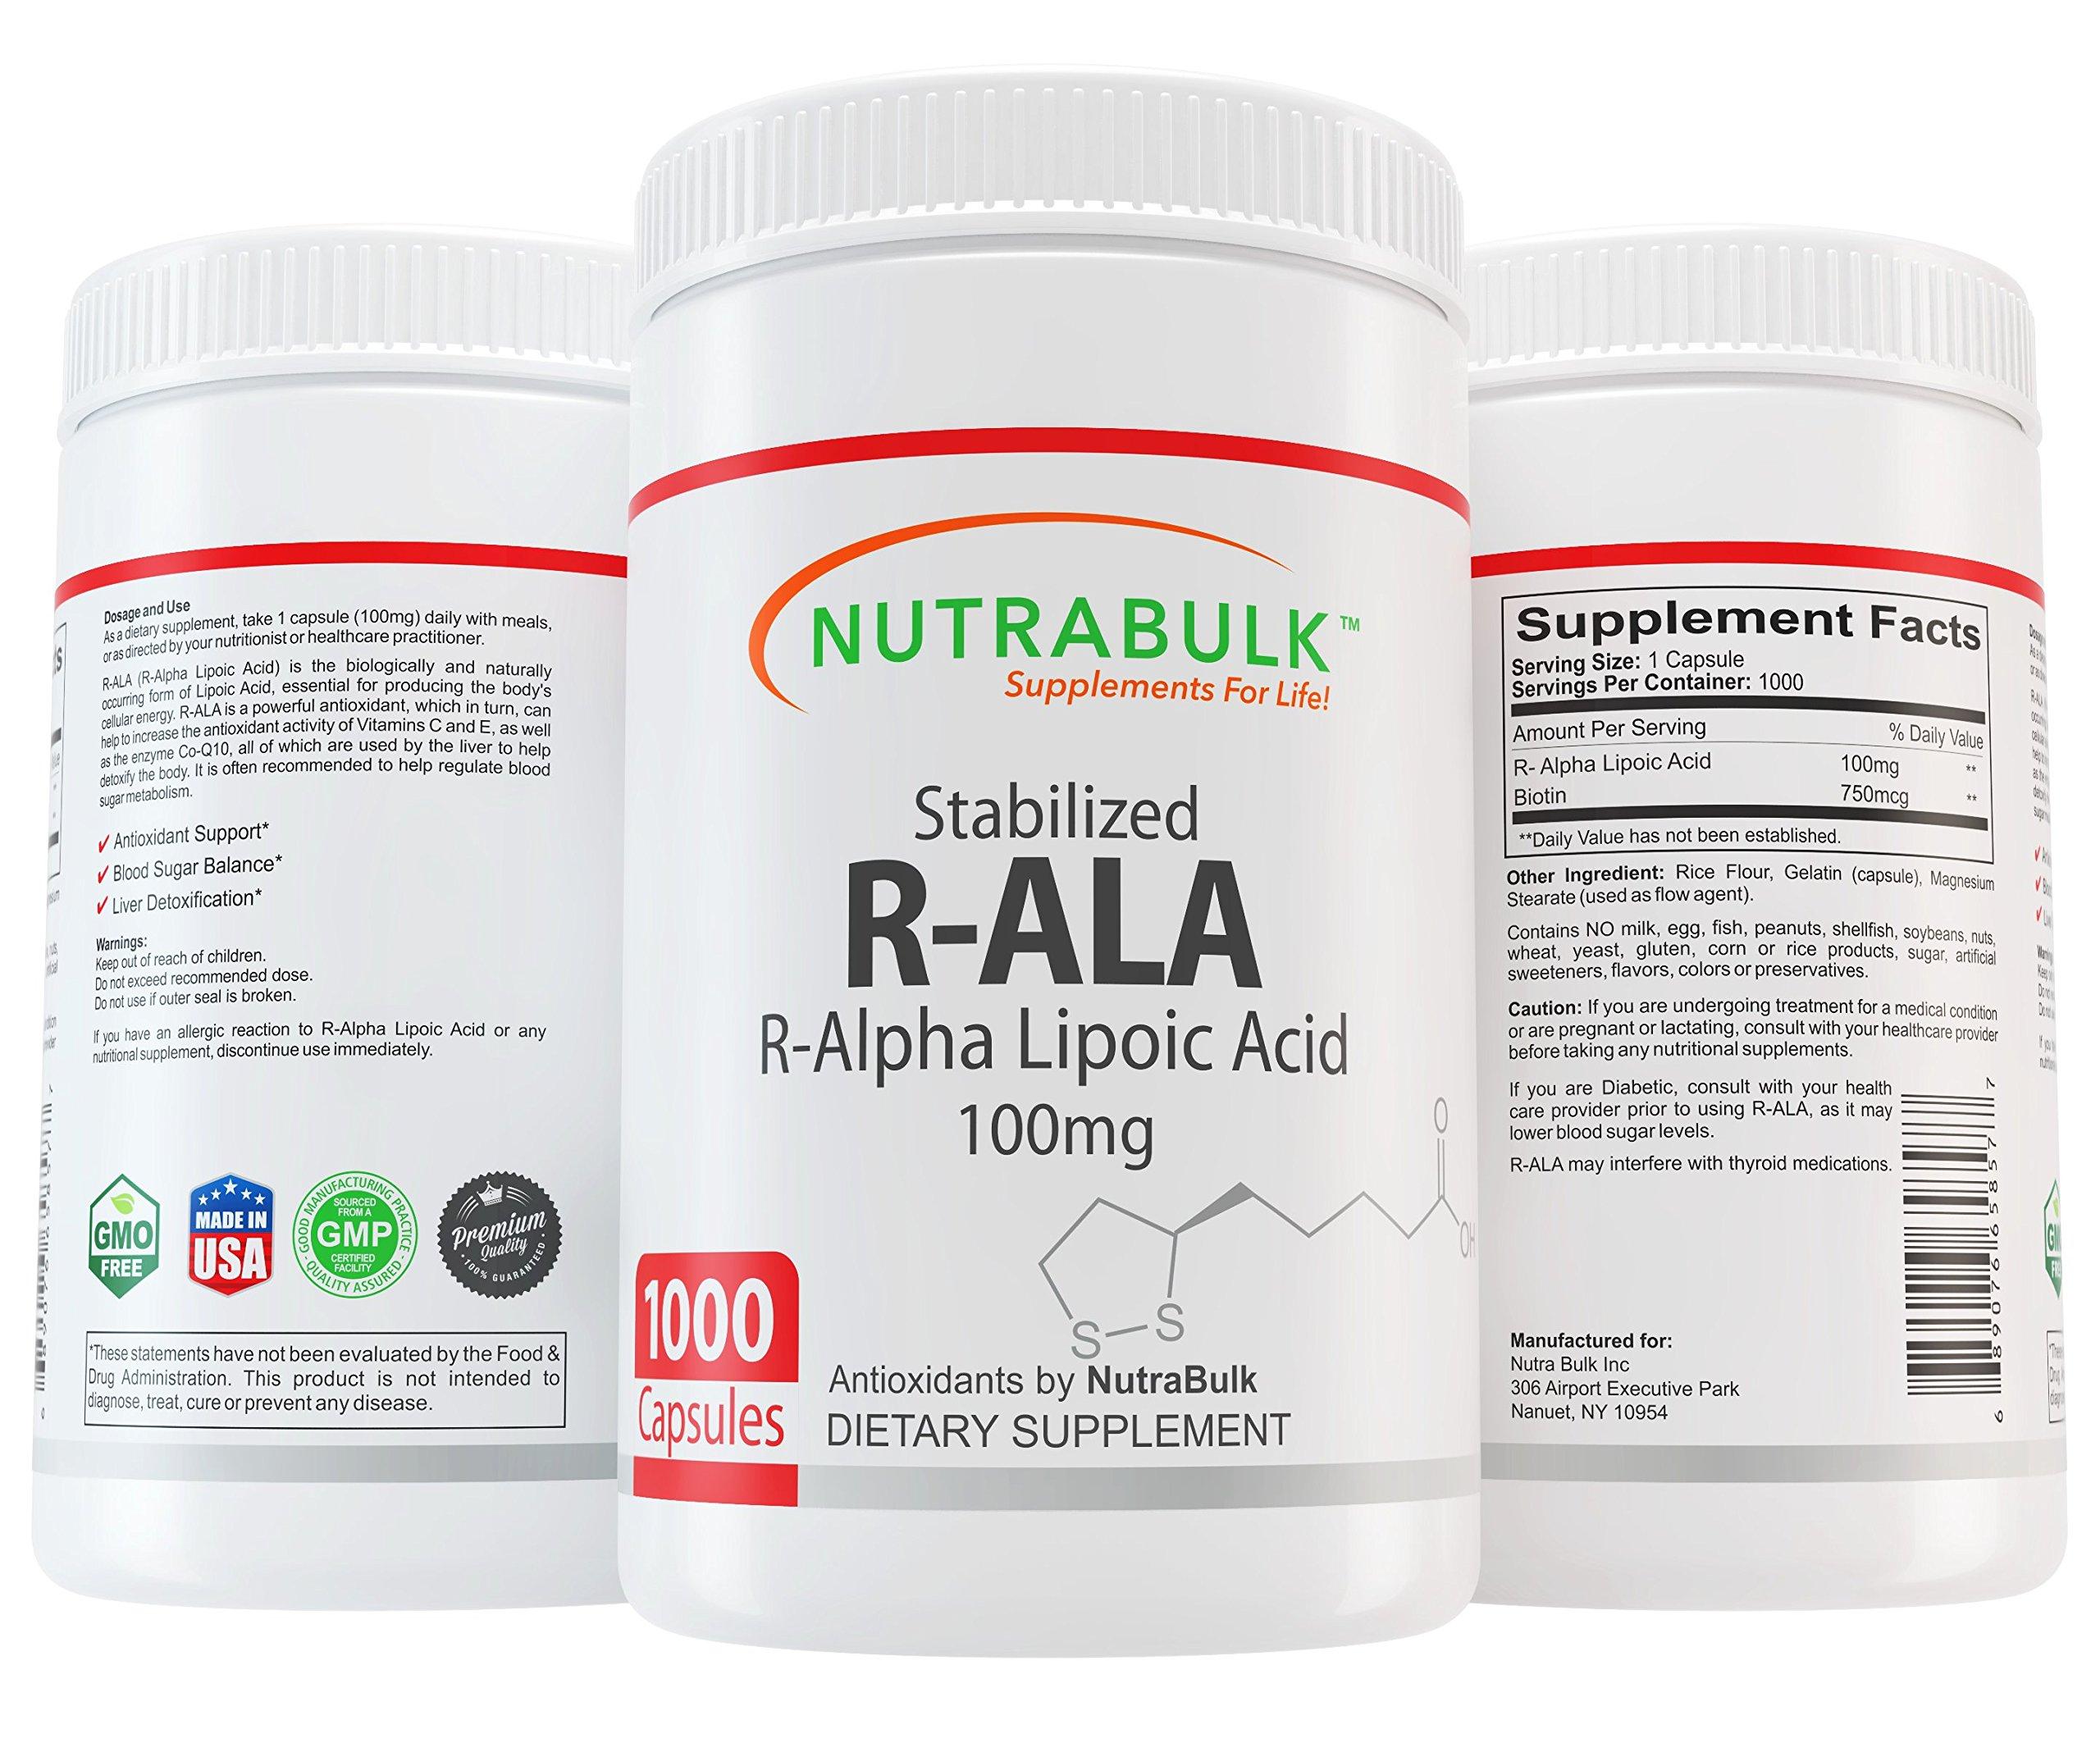 NutraBulk R-ALA (Alpha Lipoic Acid) 100mg Capsules 1000 Count